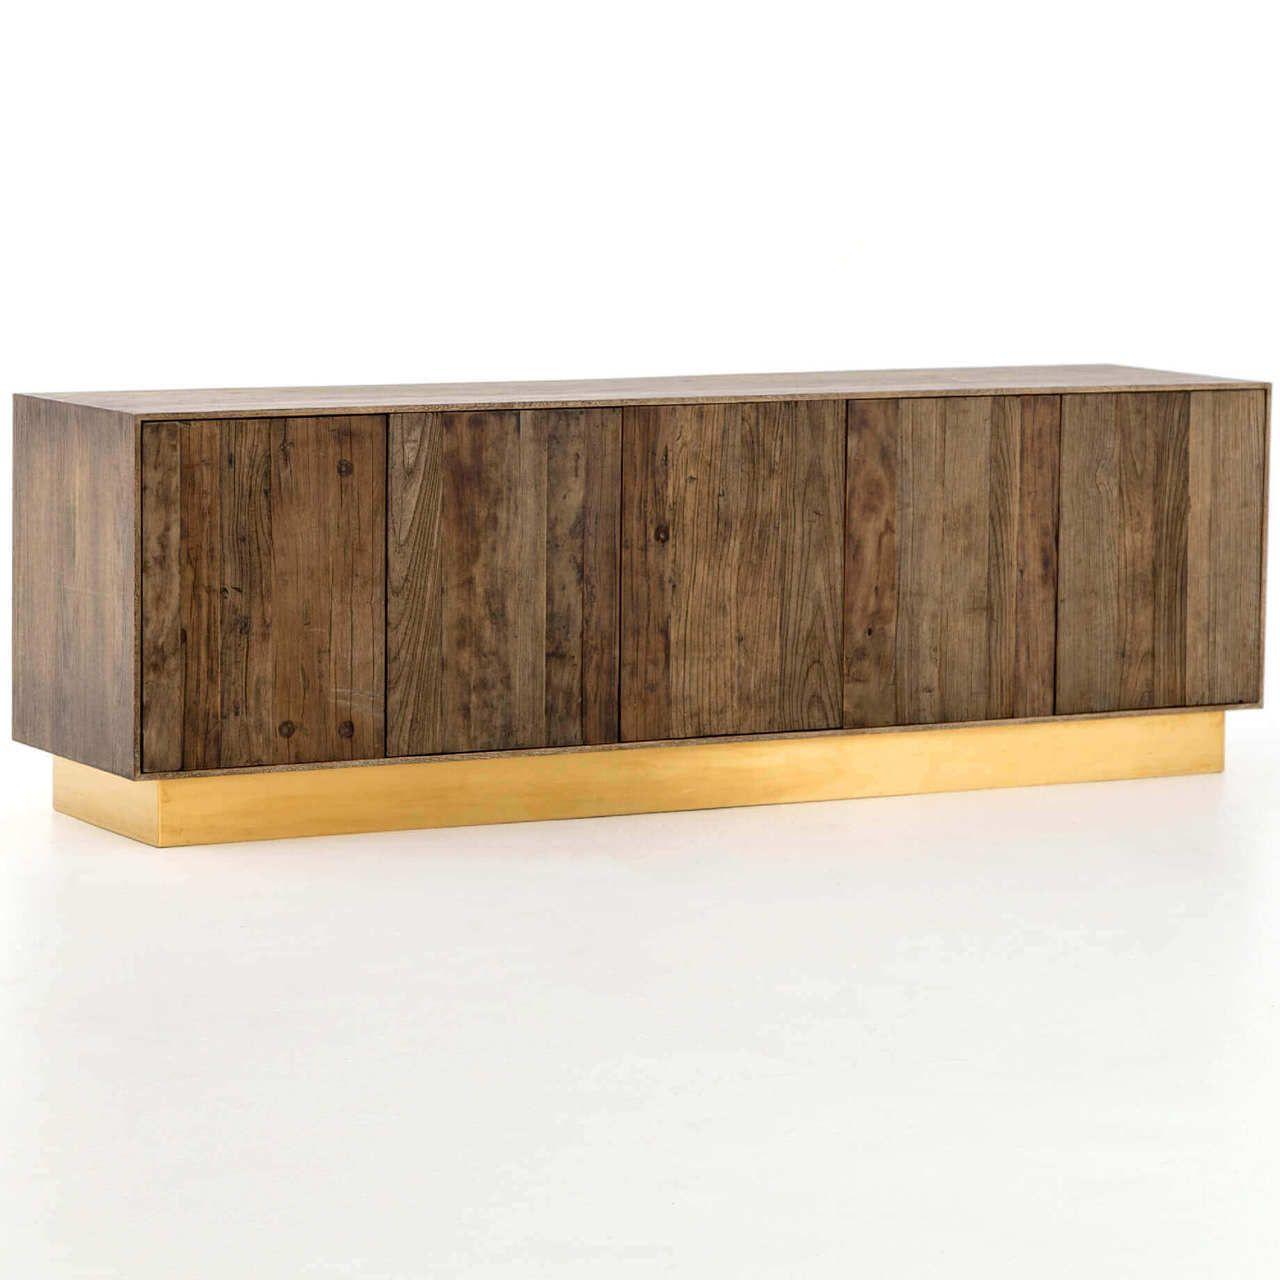 Hana Polished Br And Reclaimed Wood Media Console